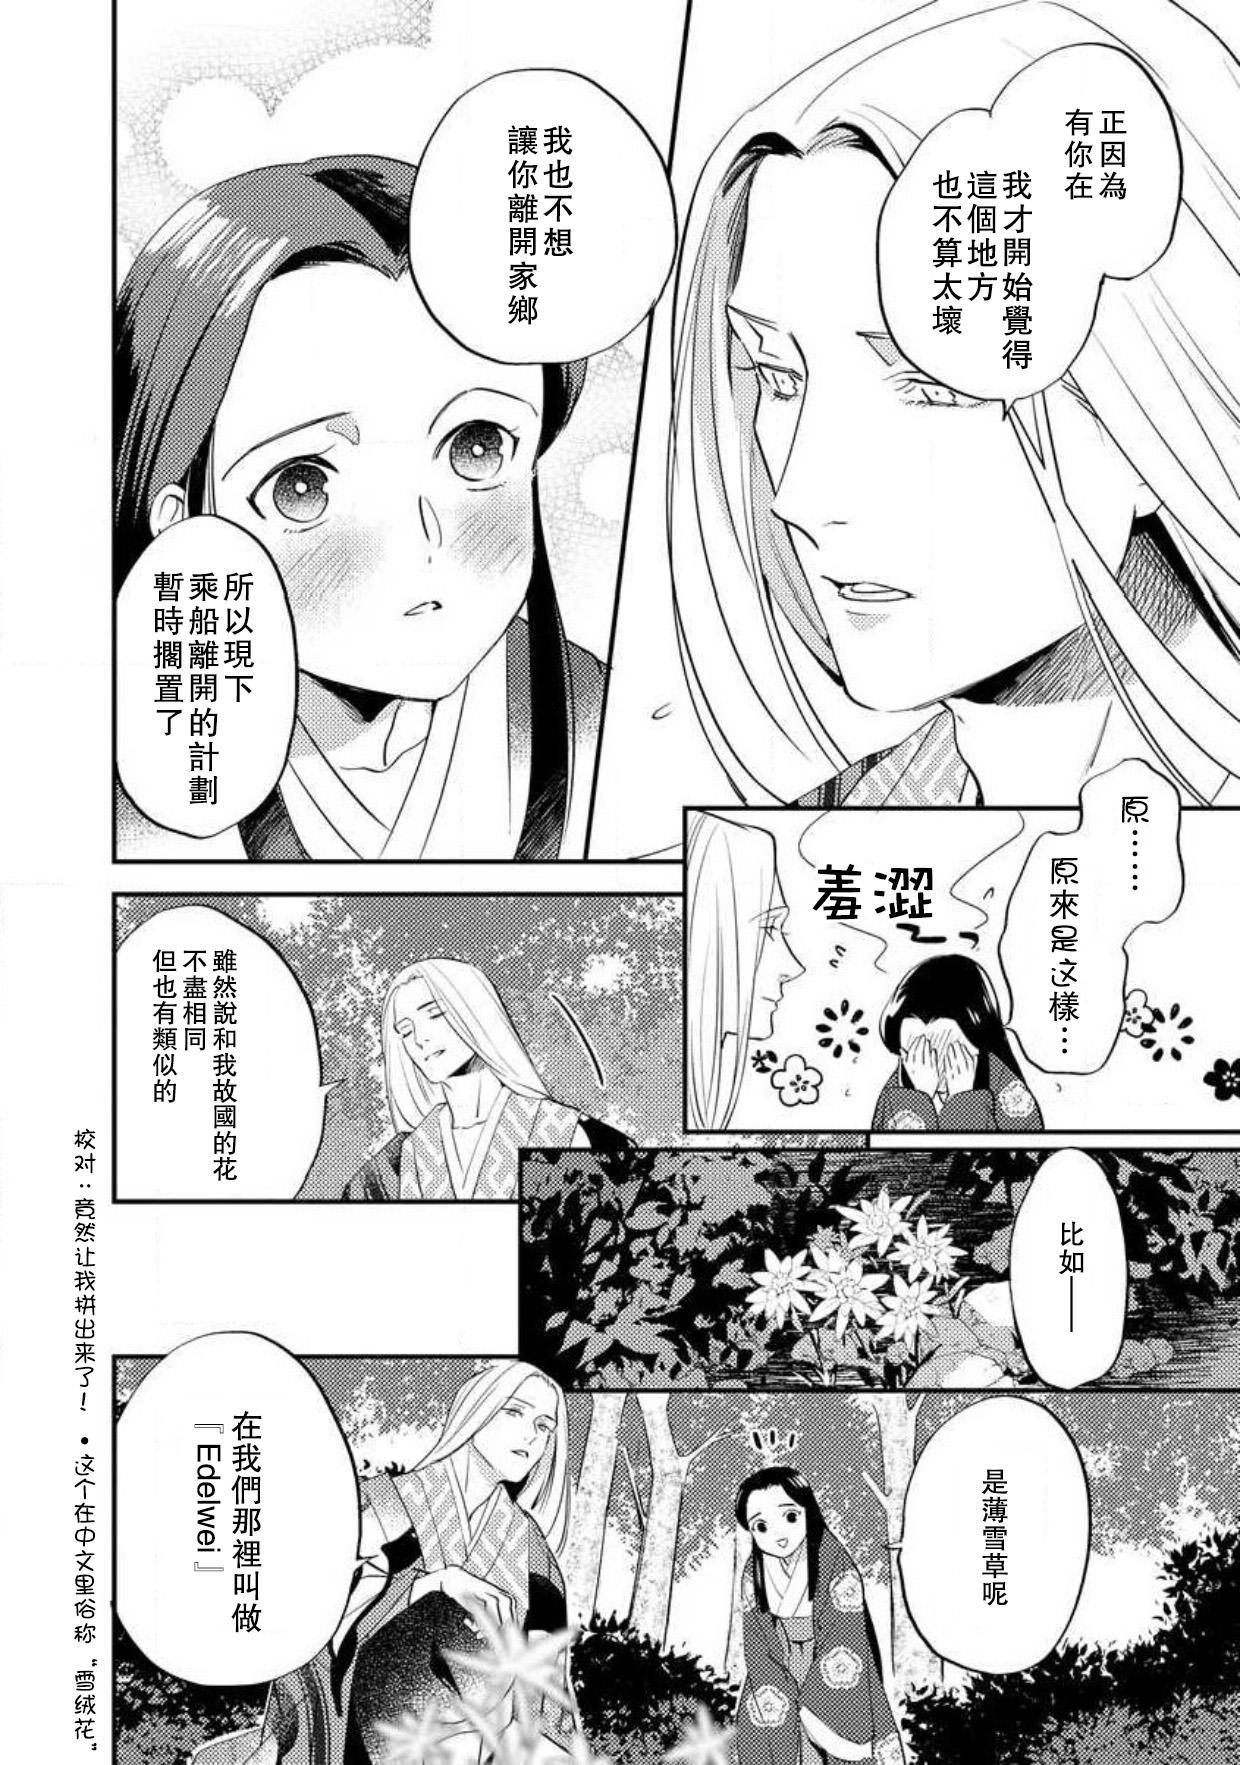 Oeyama suimutan utsukushiki oni no toraware hime | 大江山醉夢逸話 美麗的鬼與被囚禁的公主 Ch. 1-8 187